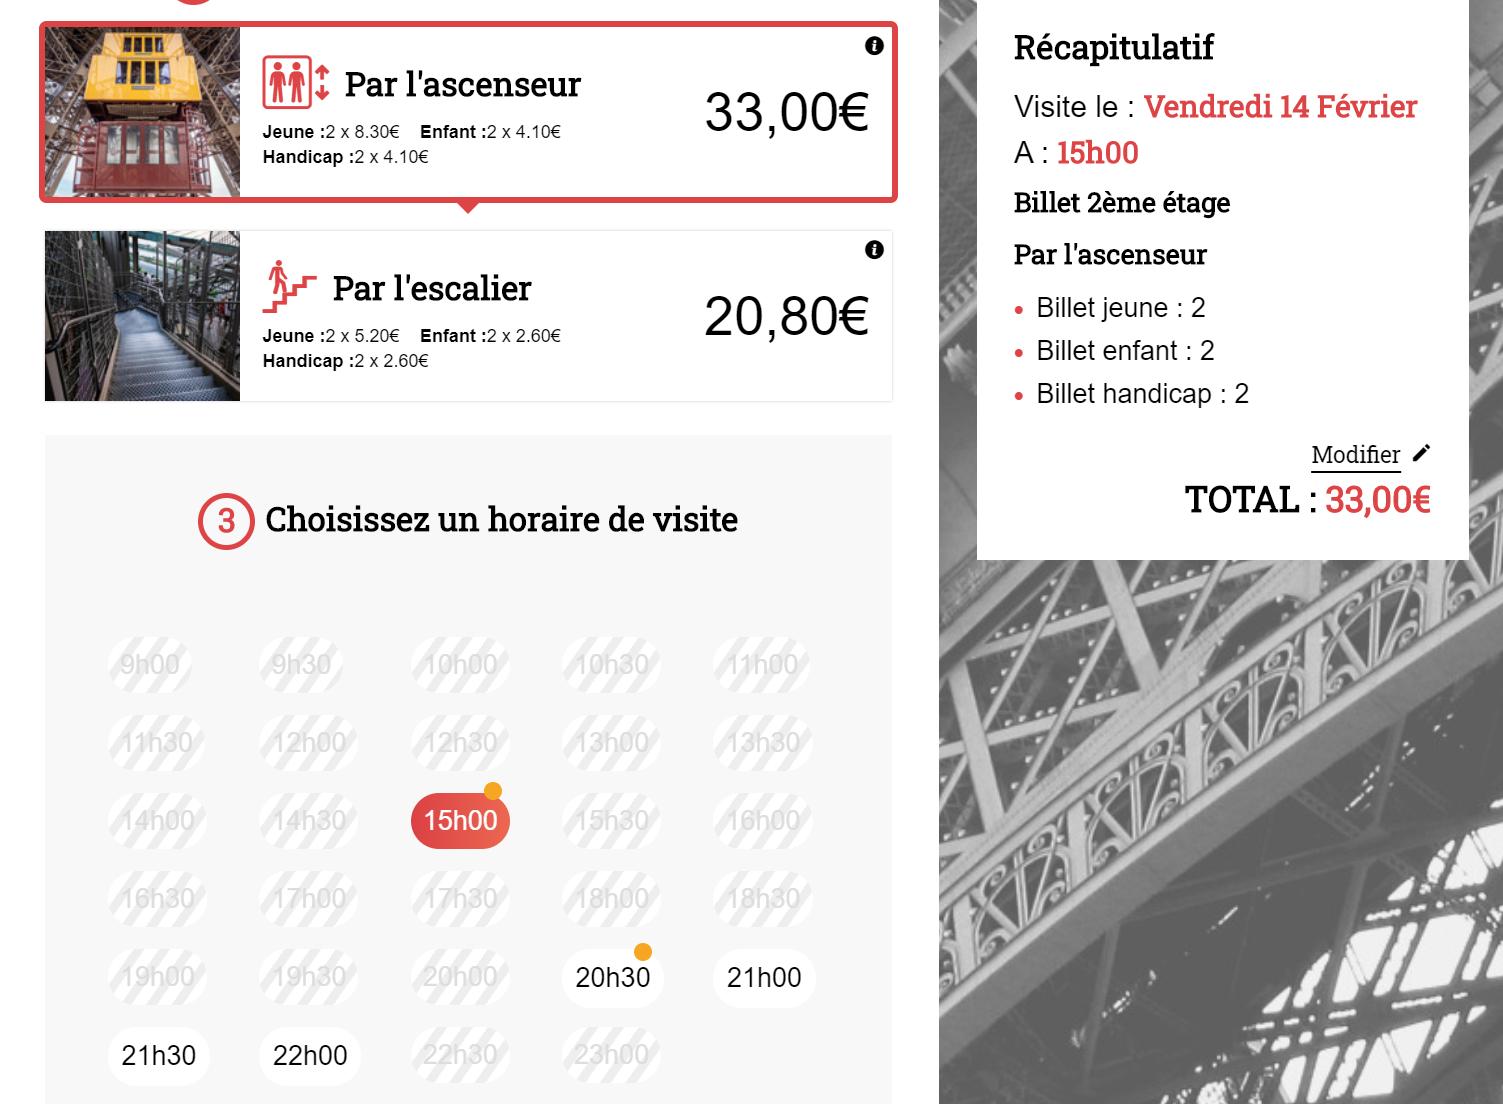 Покупка билетов на Эйфелеву башню